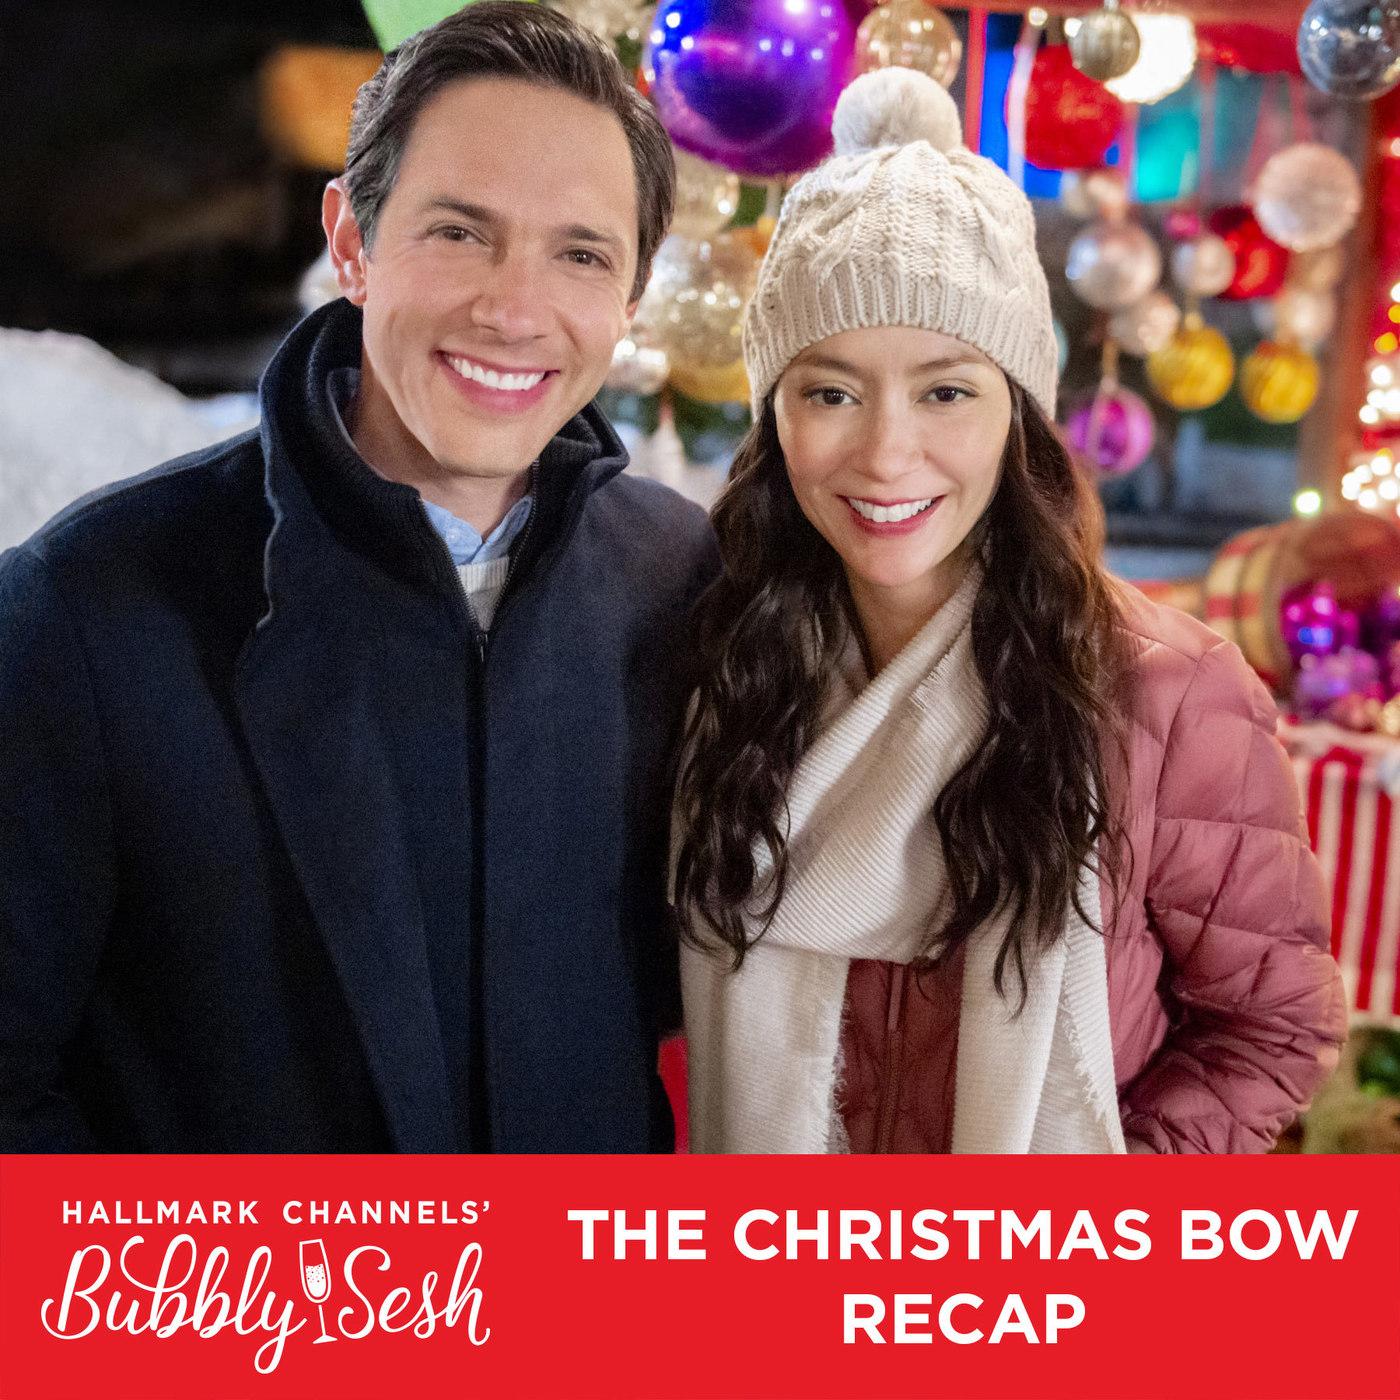 The Christmas Bow Recap